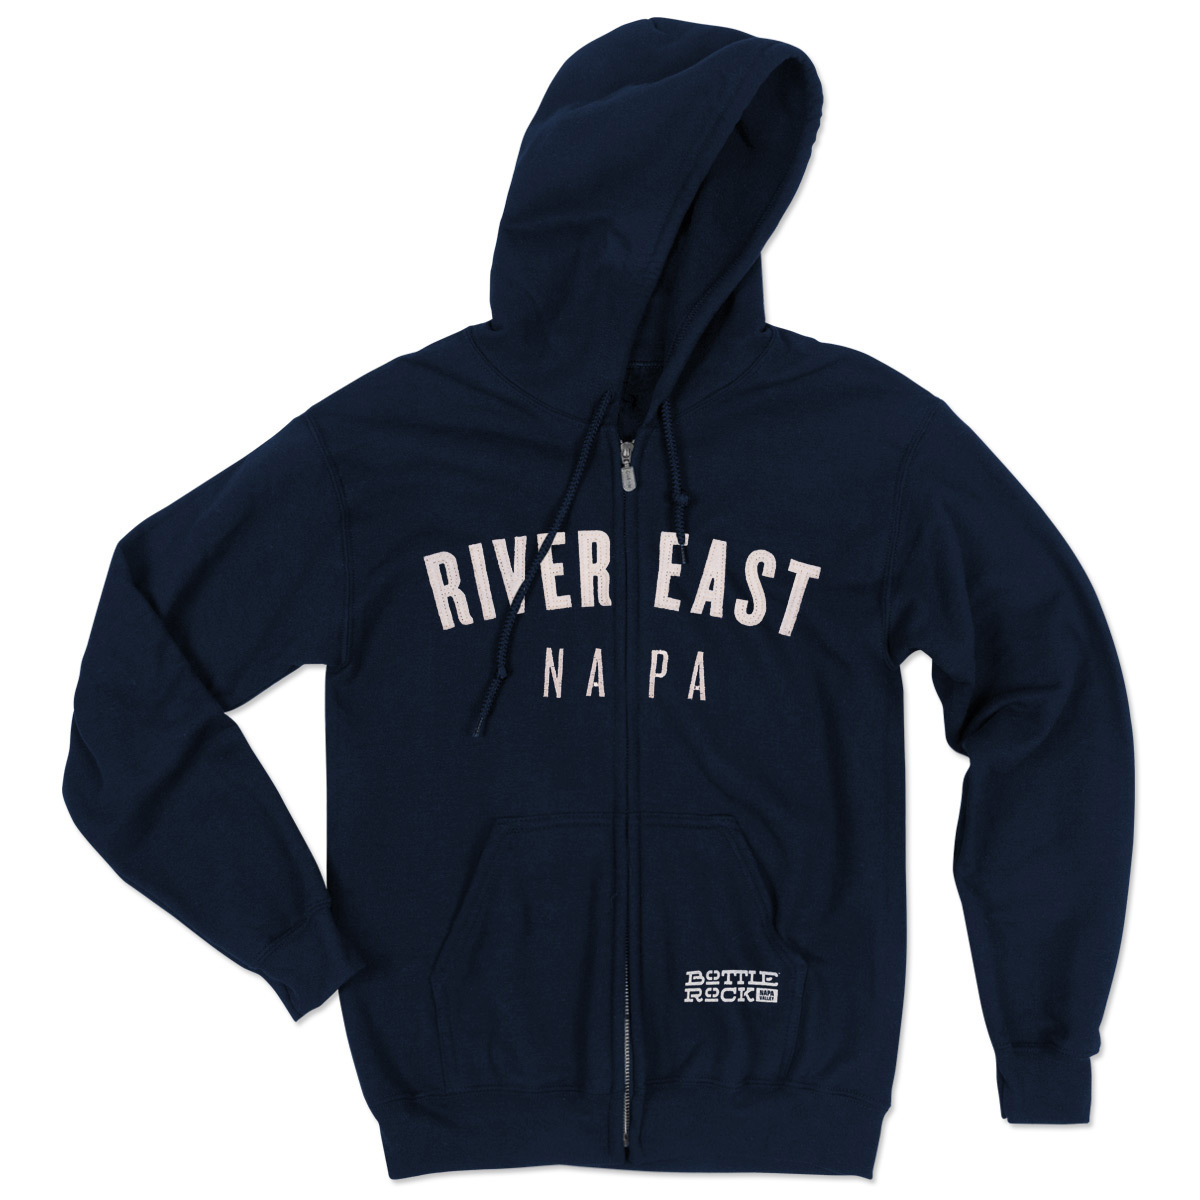 Bottle Rock Napa Valley Zip Hoodie - River East